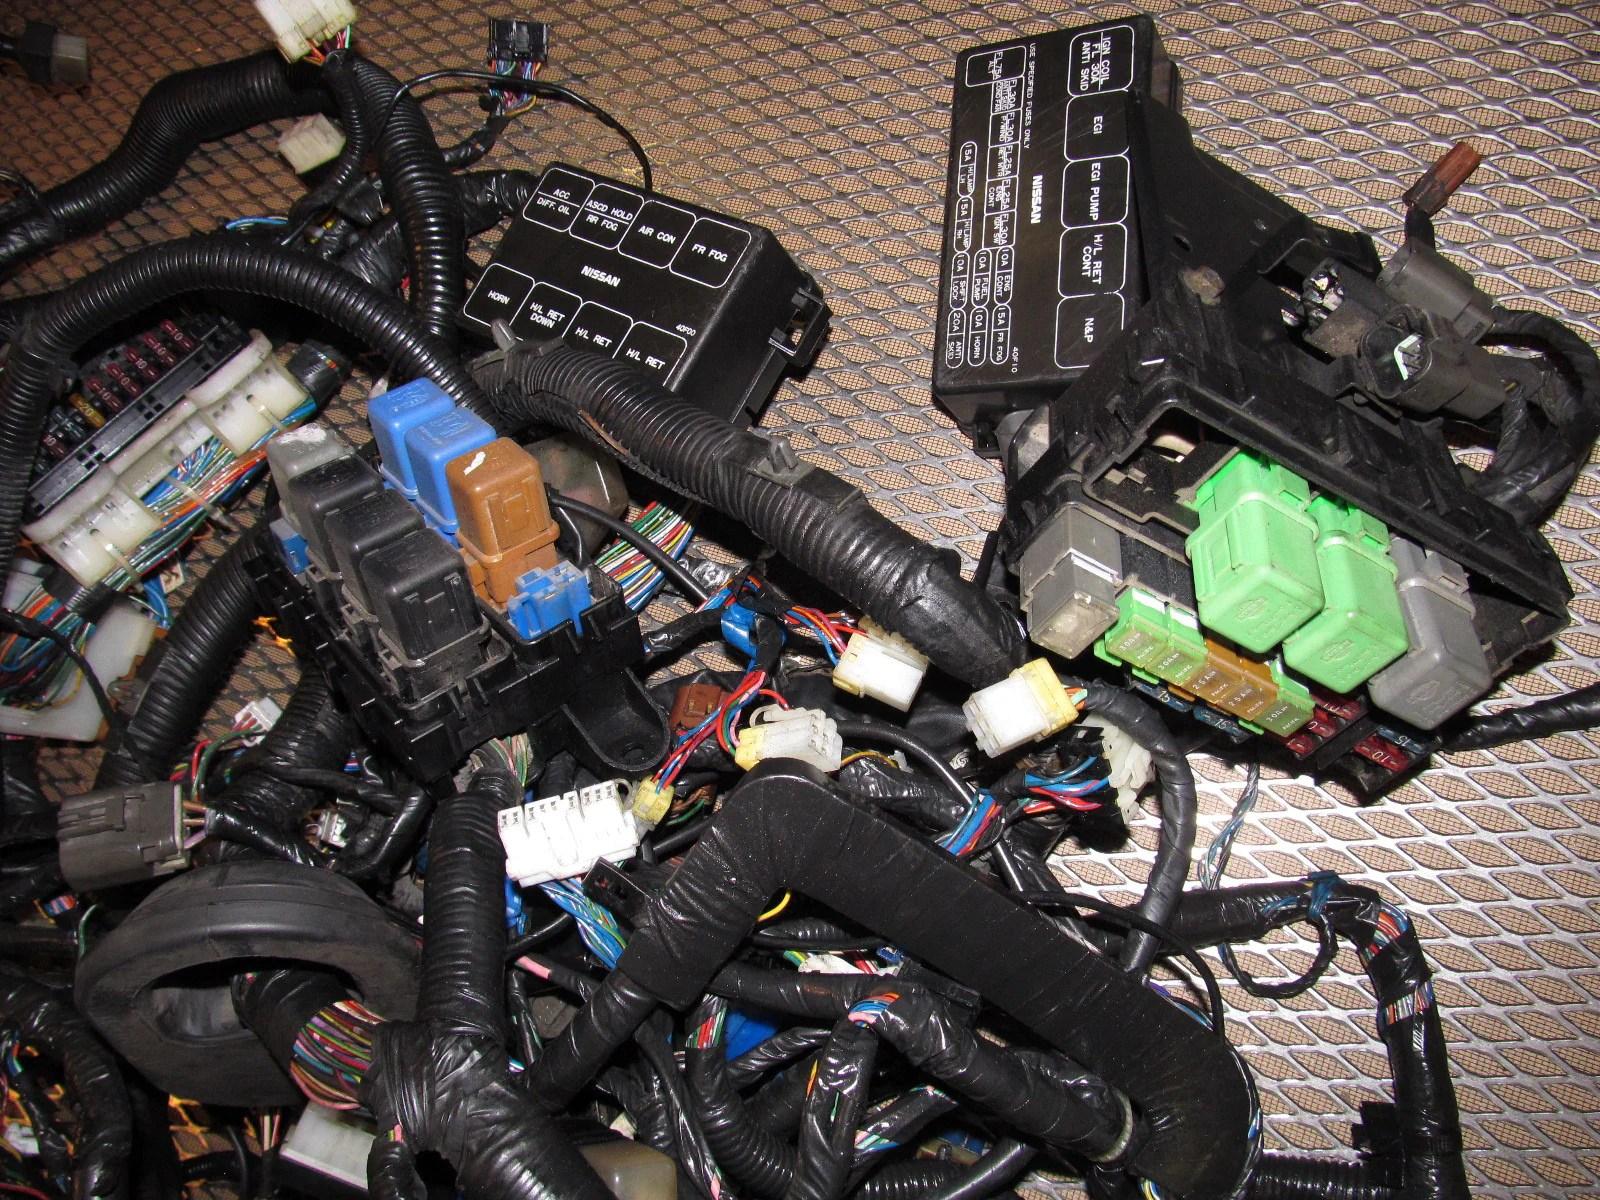 medium resolution of 89 90 nissan 240sx oem fuse box wiring harness autopartone com rh autopartone com 240sx fuel pump fuse 95 98 240sx fuse box interior